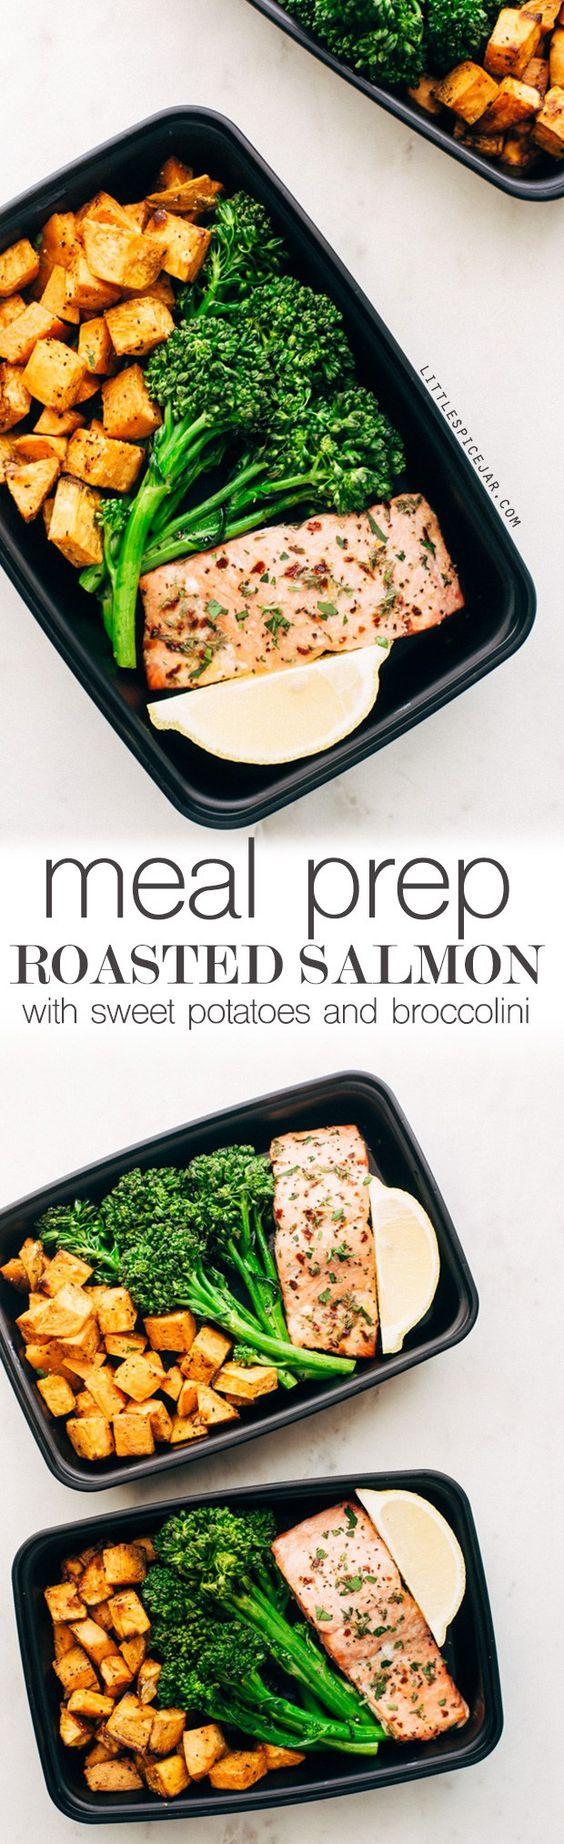 http://littlespicejar.com/lemon-roasted-salmon/